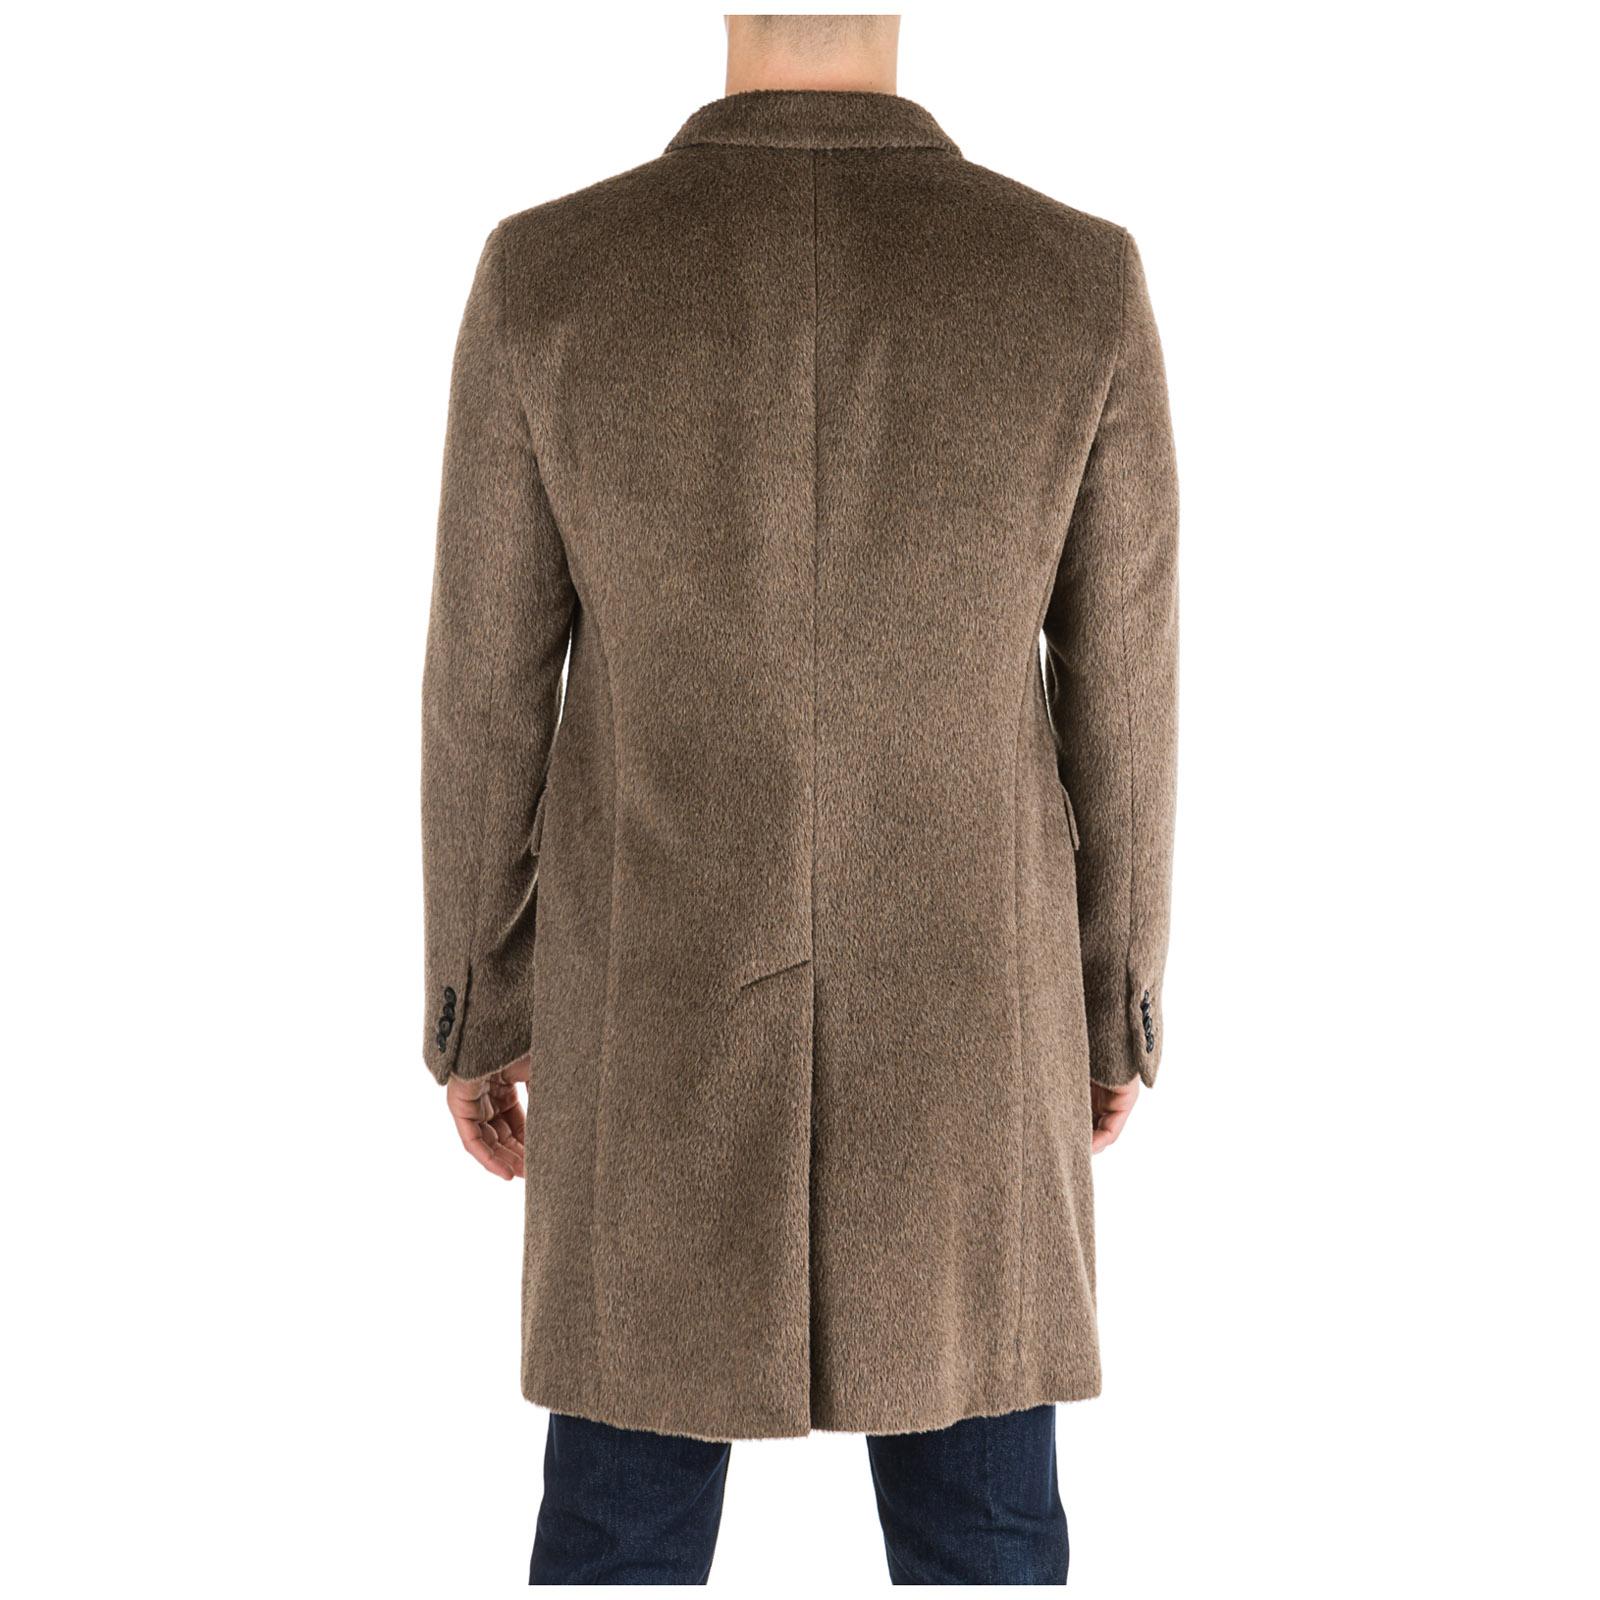 518223d7bf21 Double boutonnage manteau homme Double boutonnage manteau homme ...